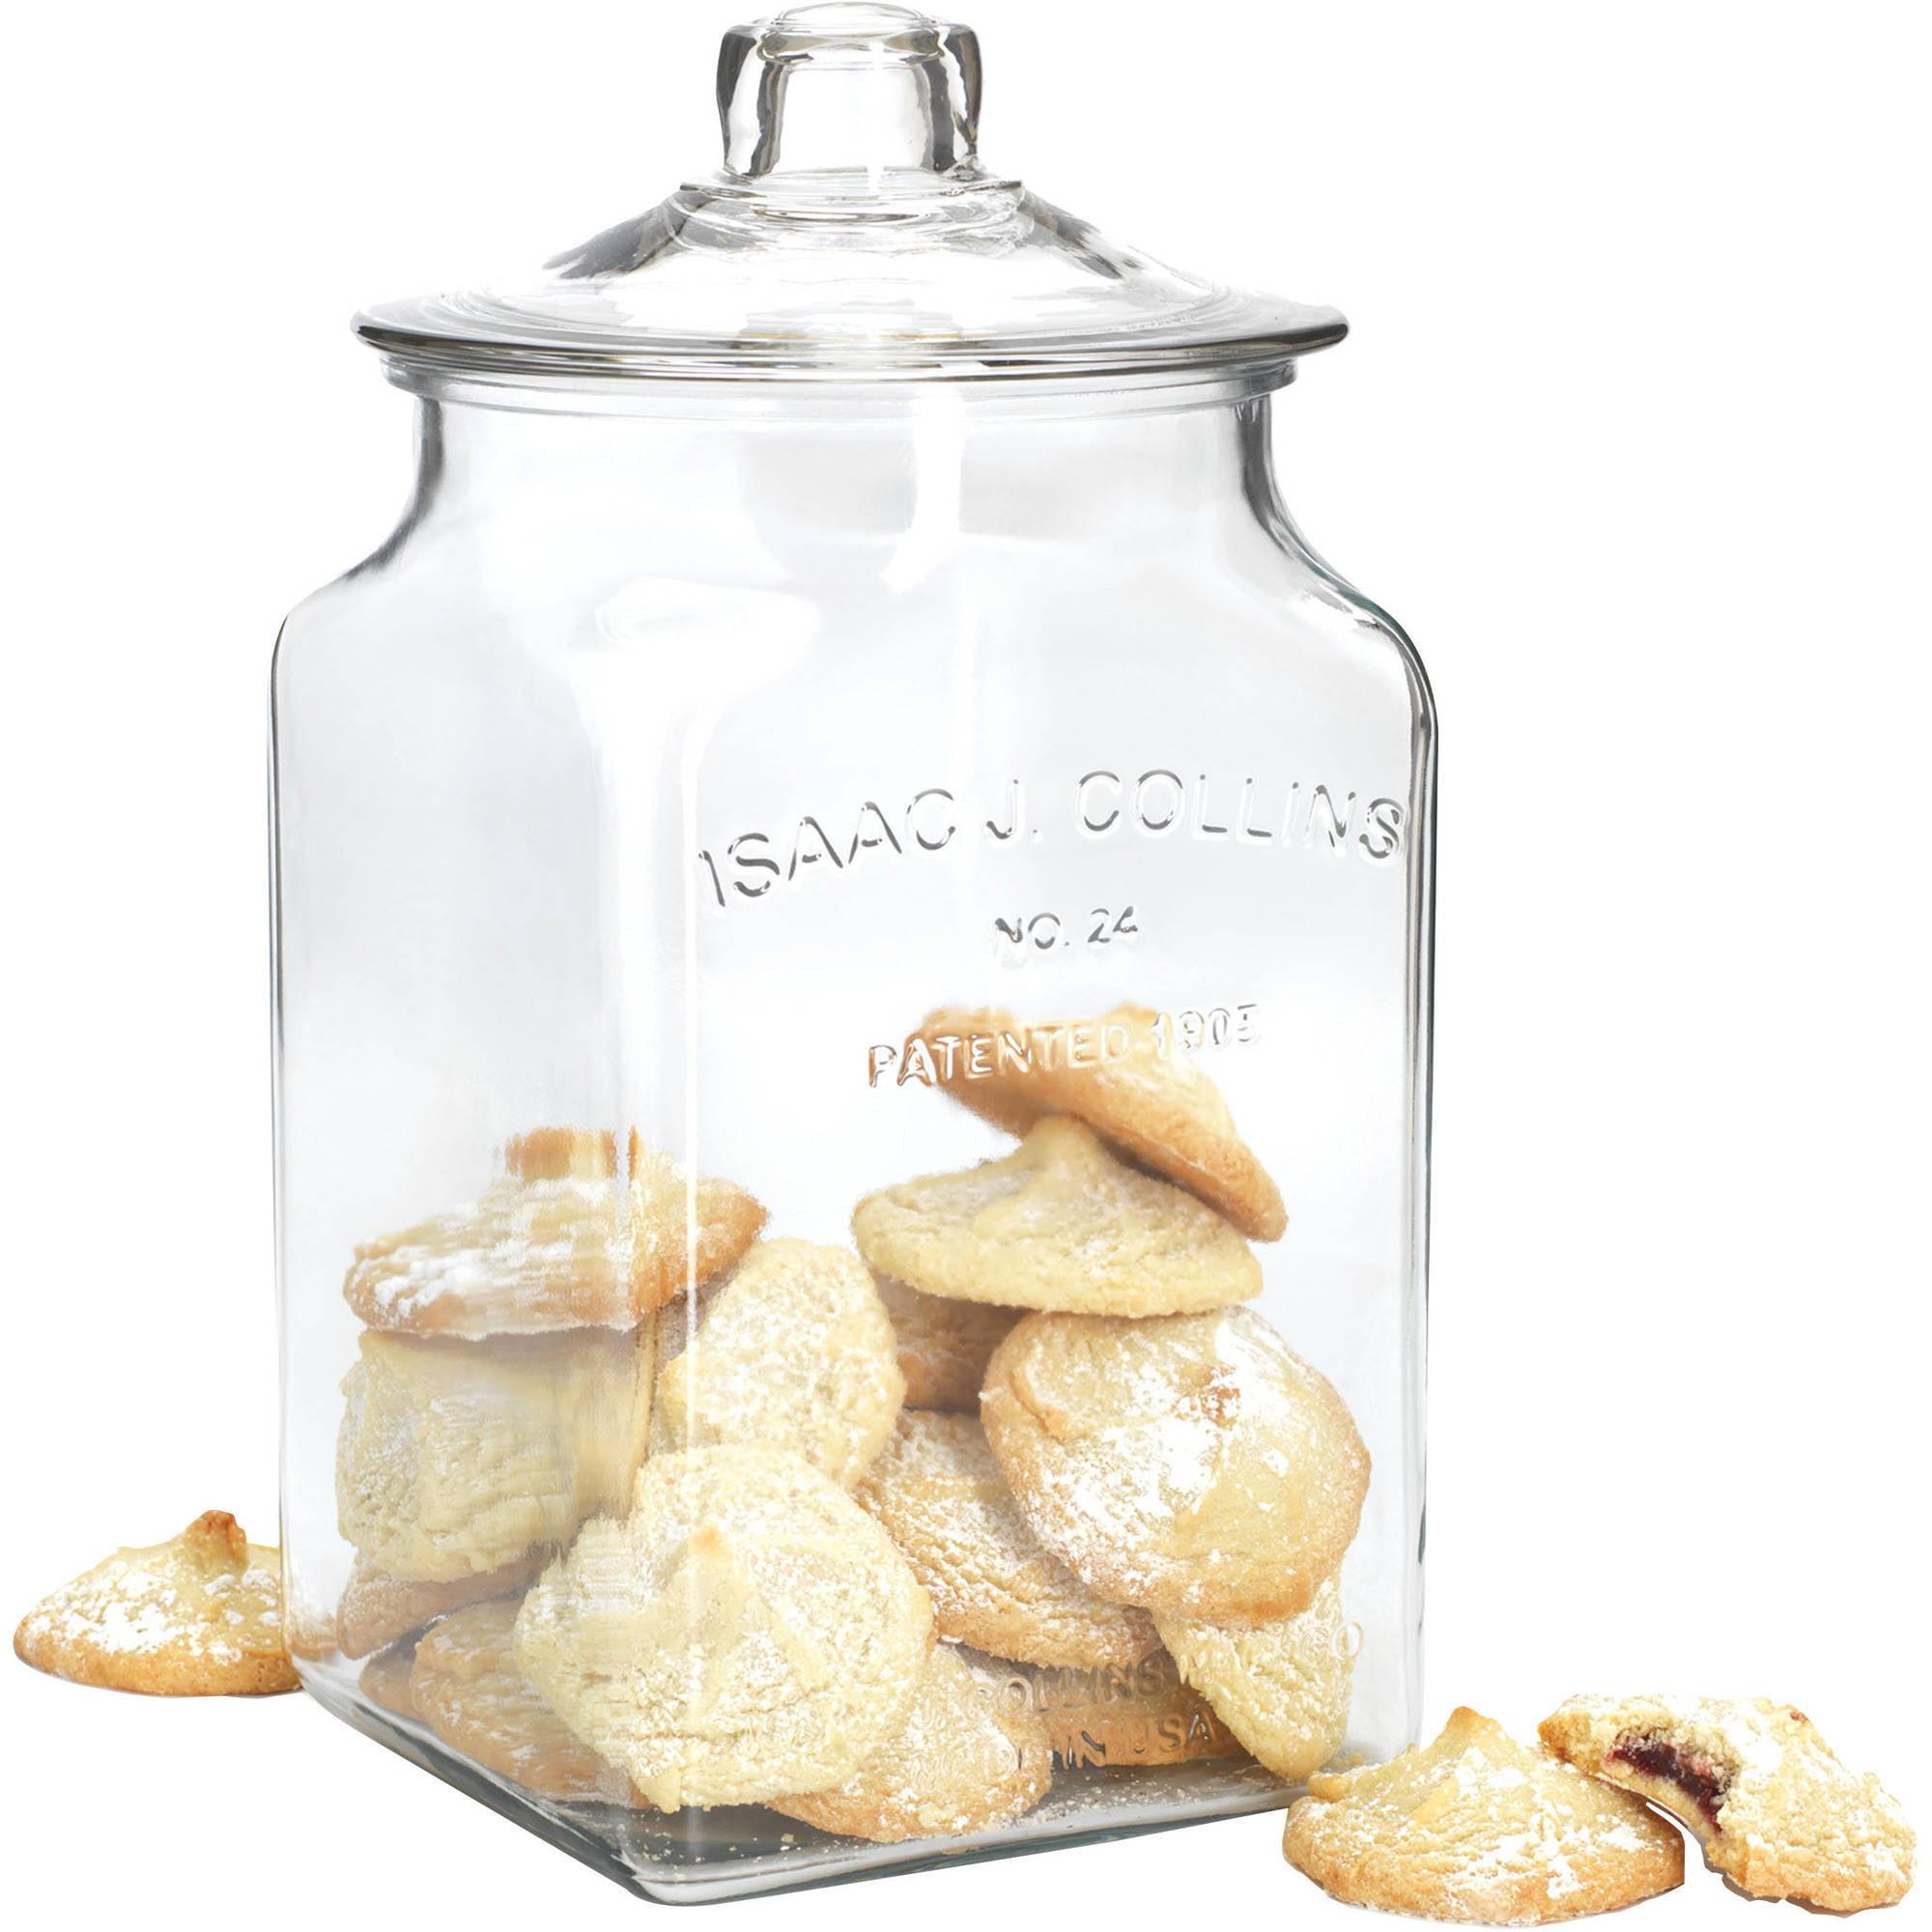 Anchor Hocking 1.5 Gallon IJ Collins Square Glass Jar